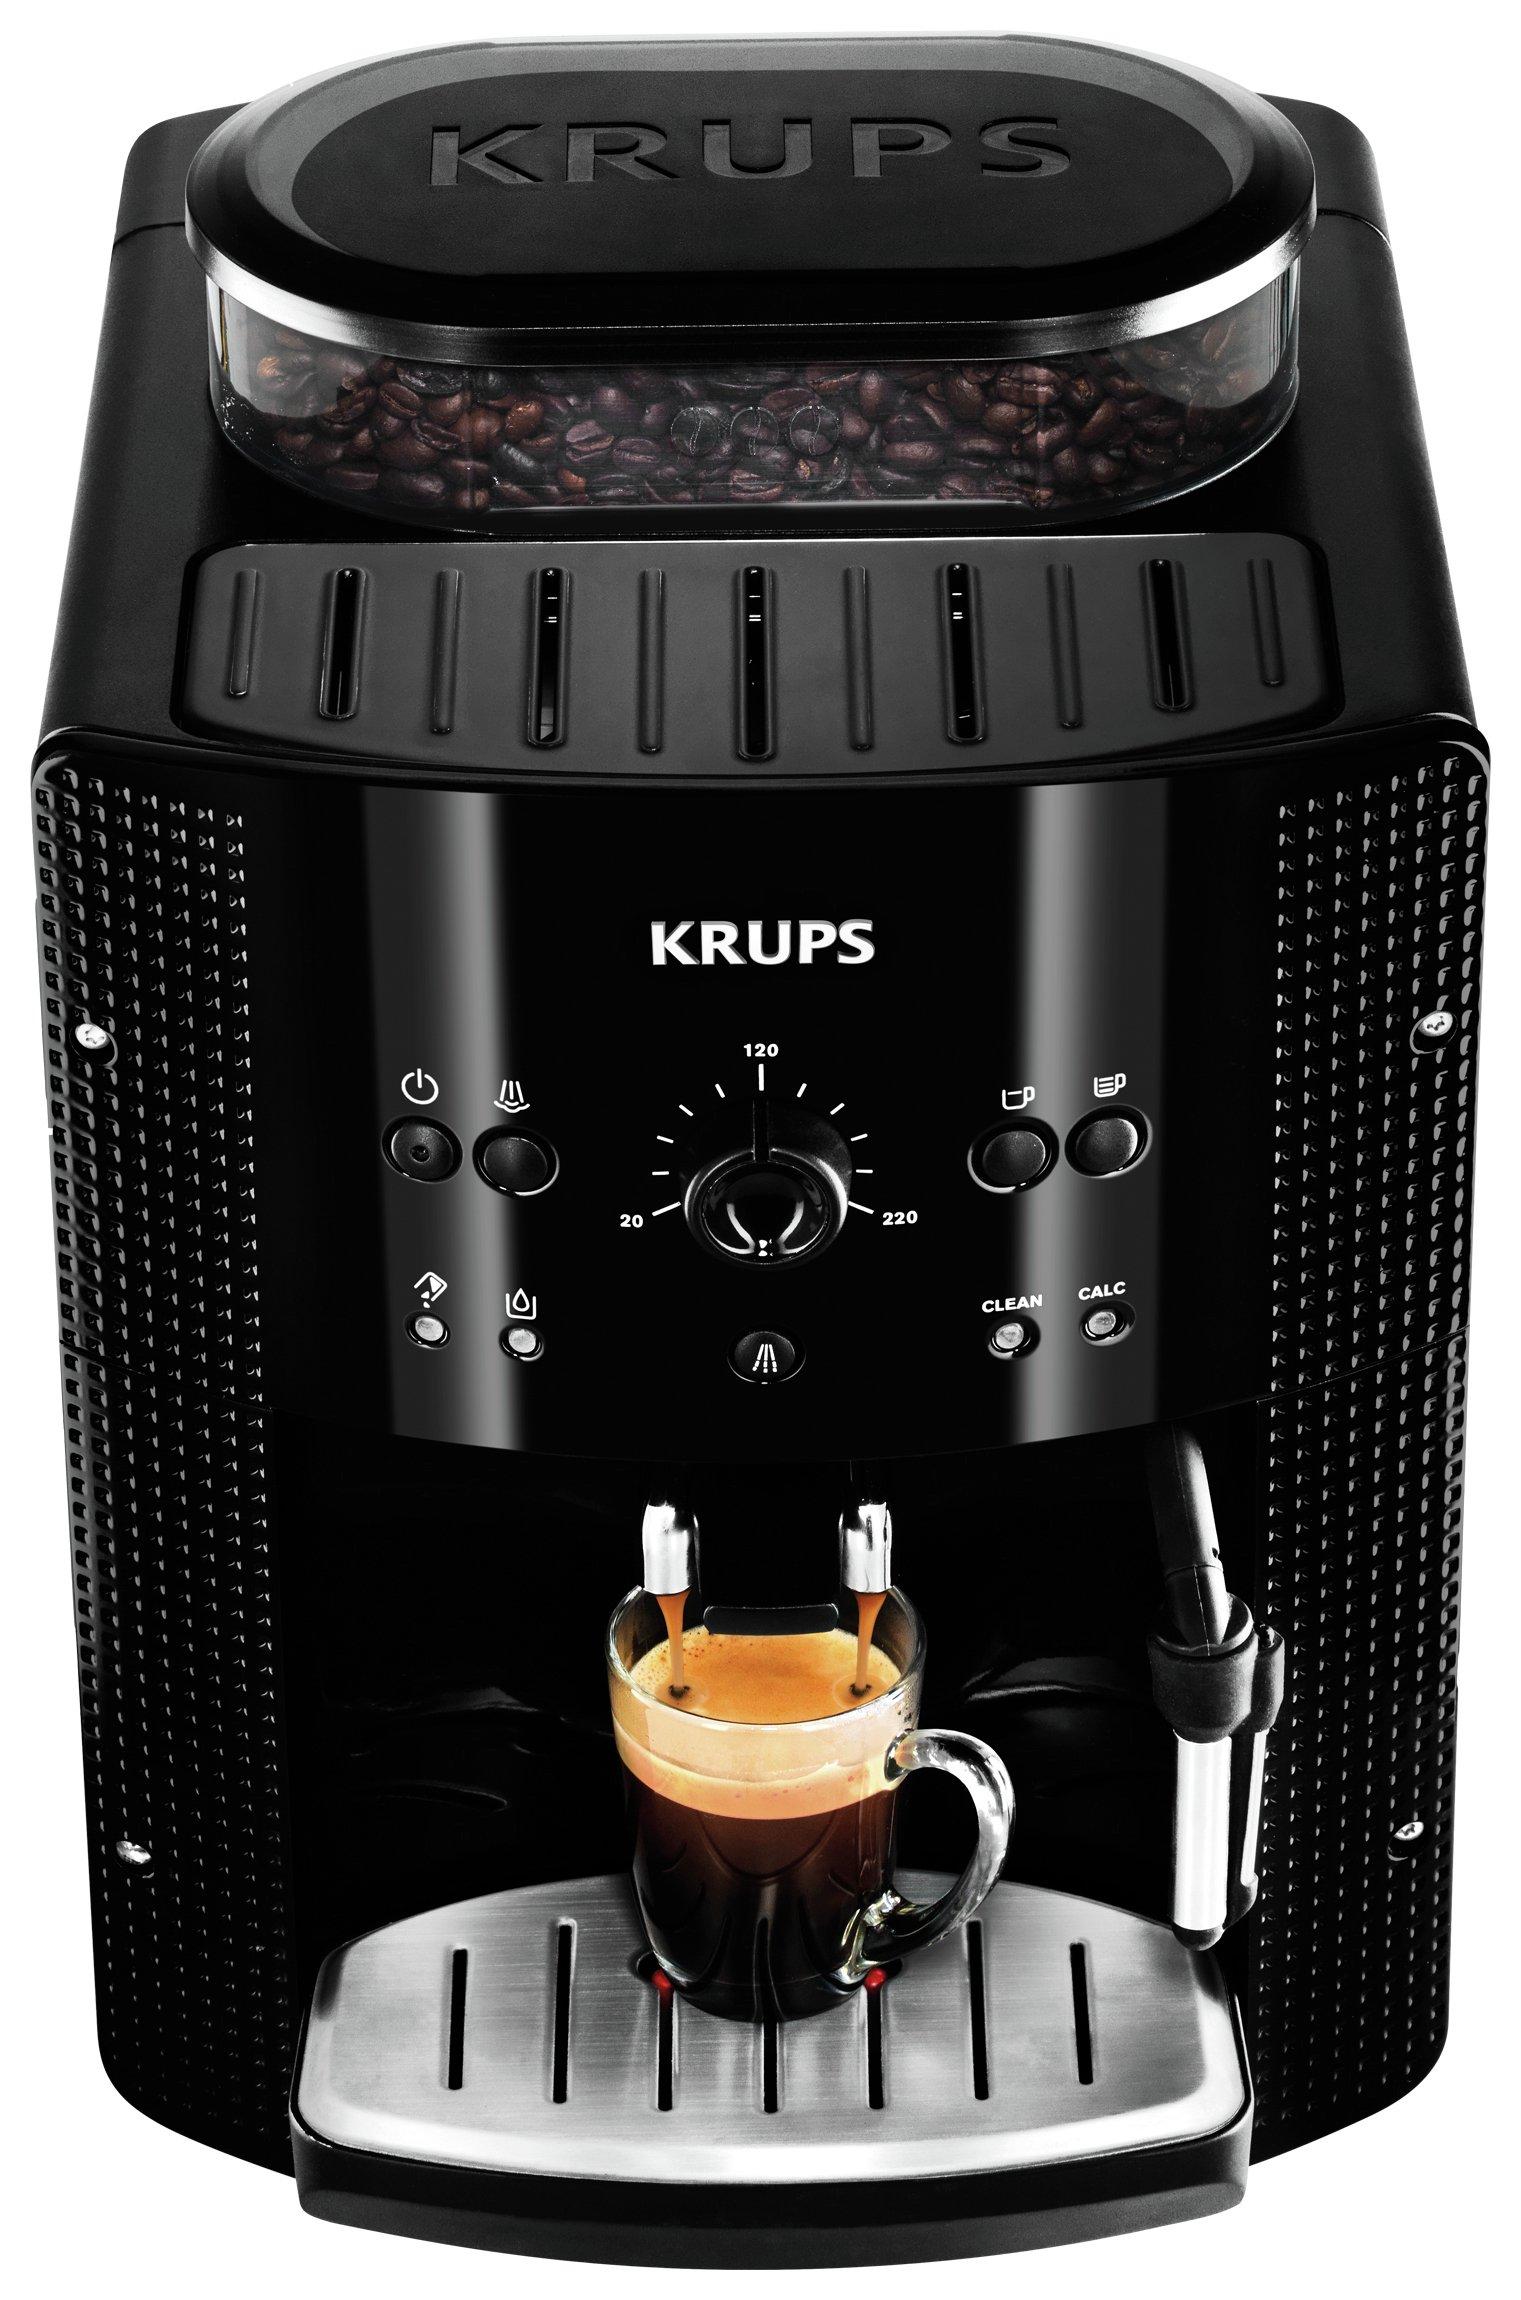 Krups Espresseria Ea8108 Bean To Cup Coffee Machine